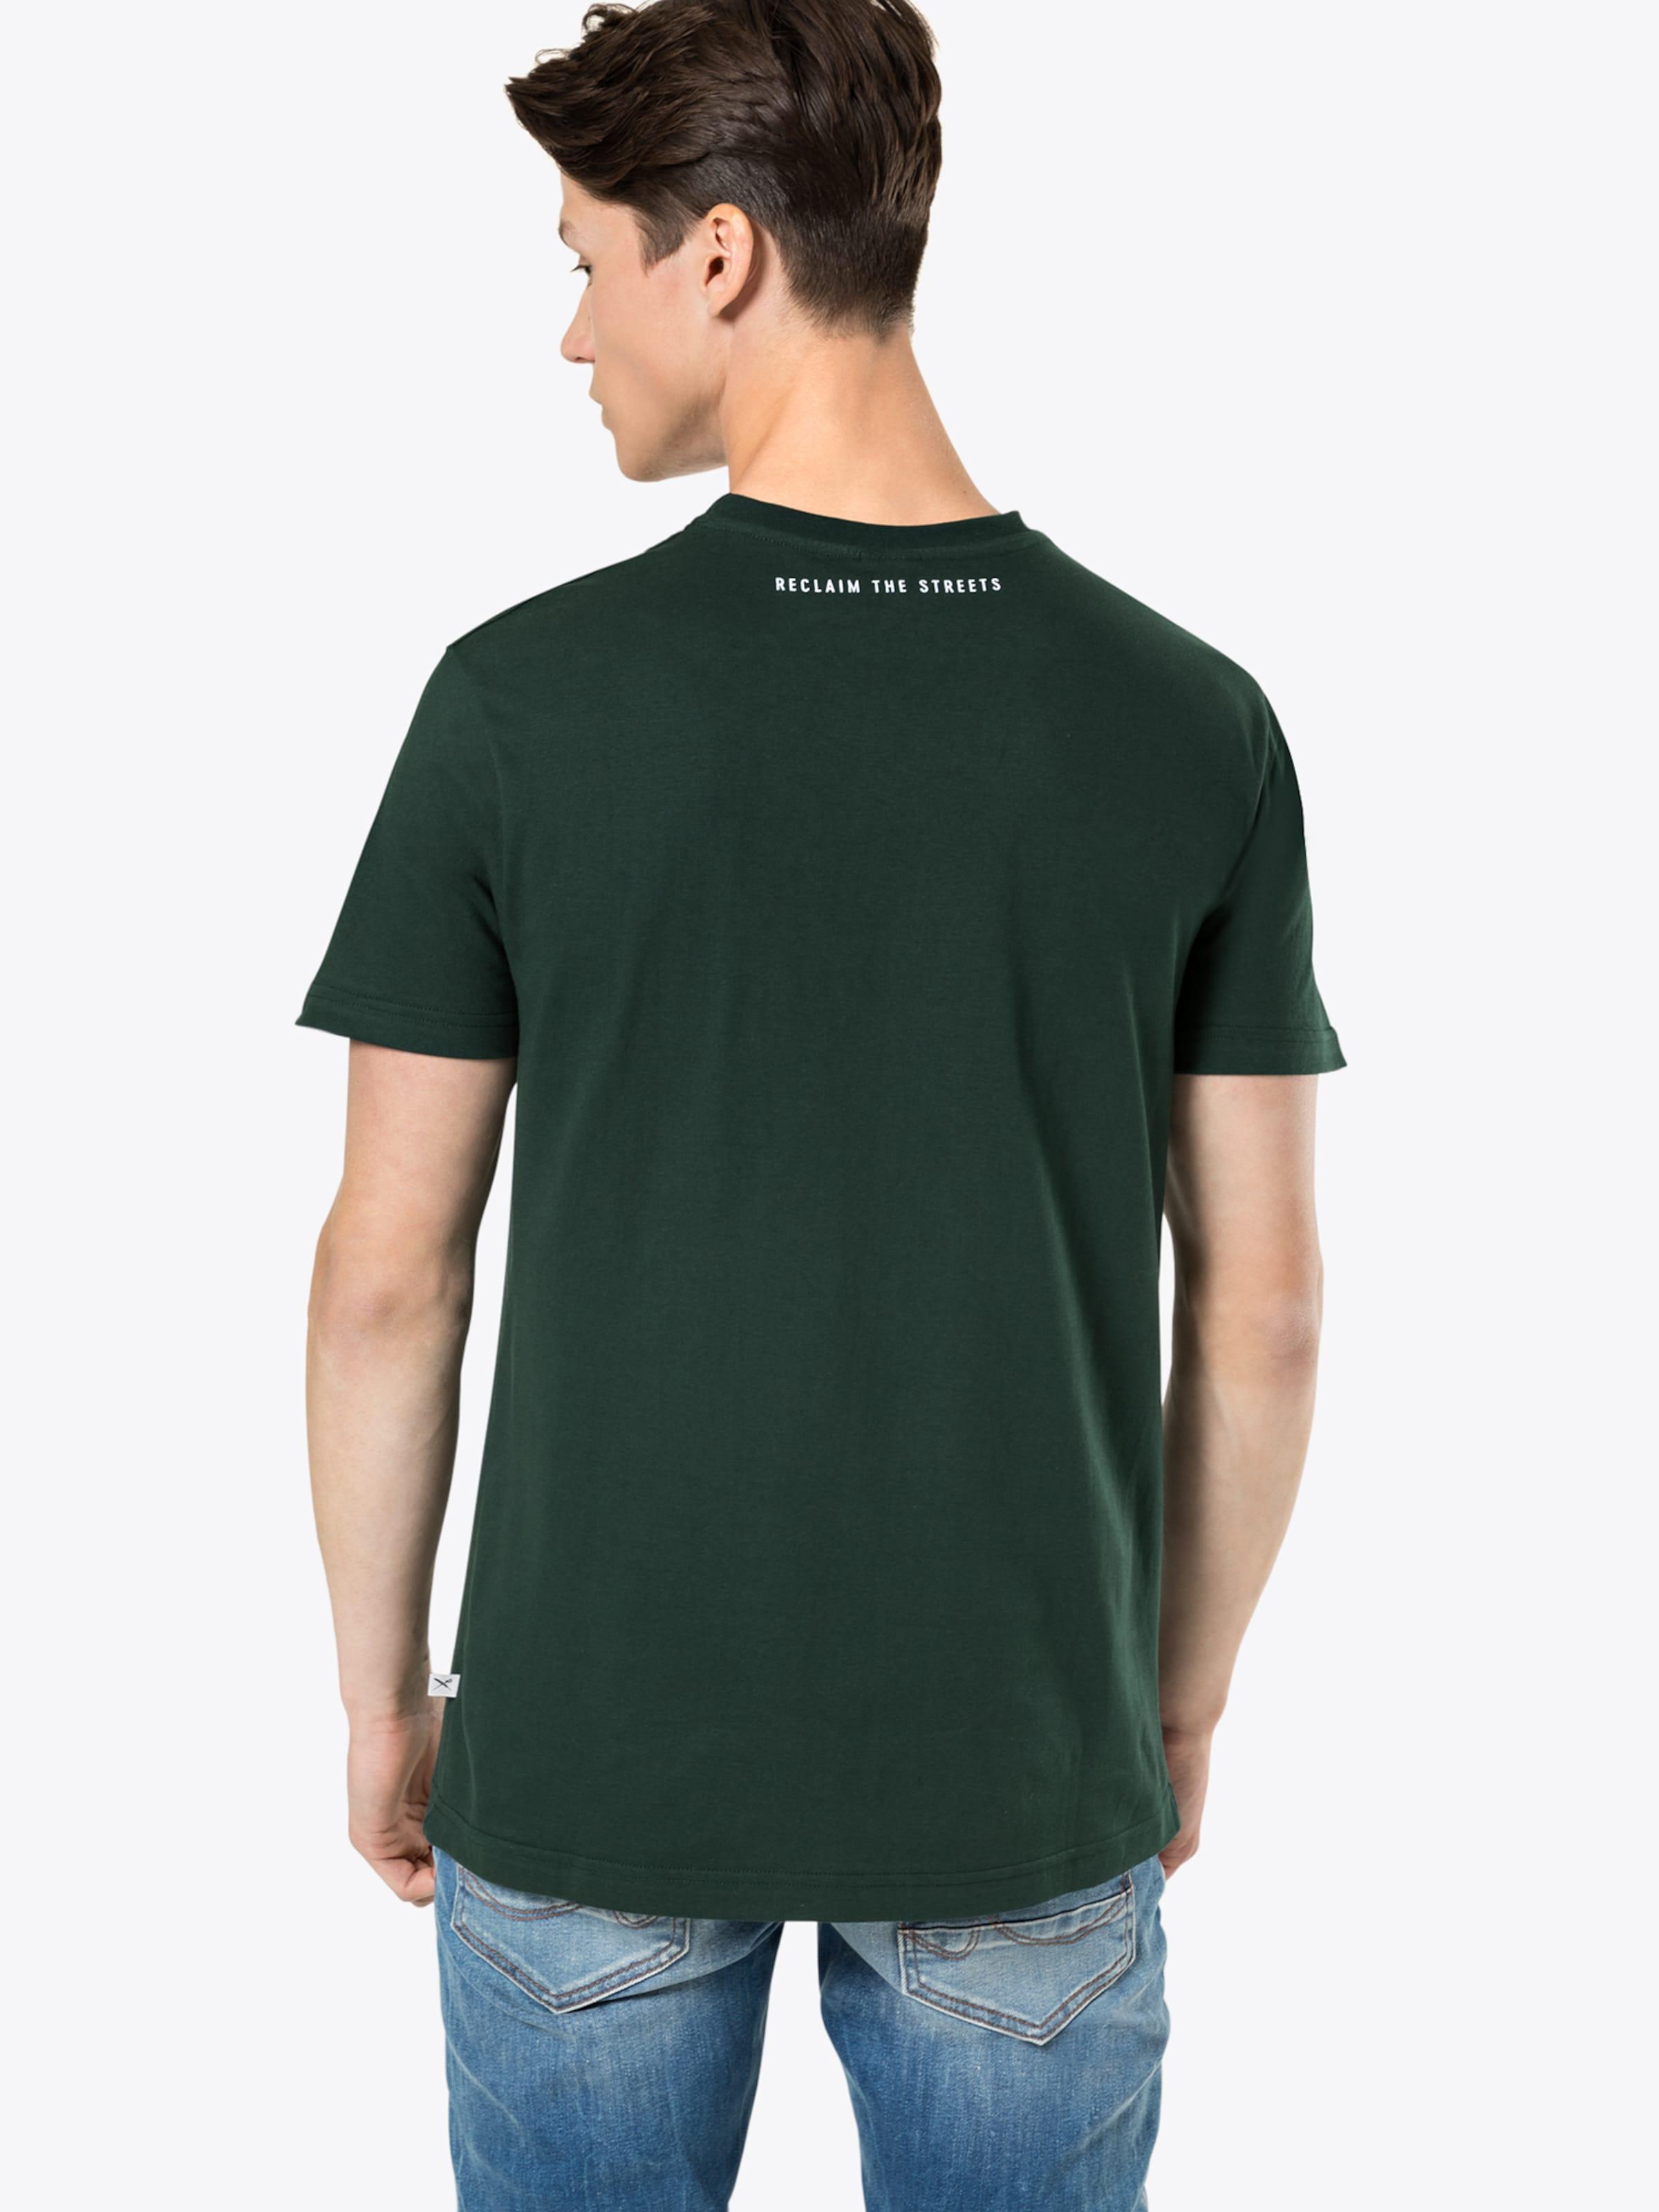 shirt Iriedaily Tanne T Tee' In 'tagg qzMGSpLUV